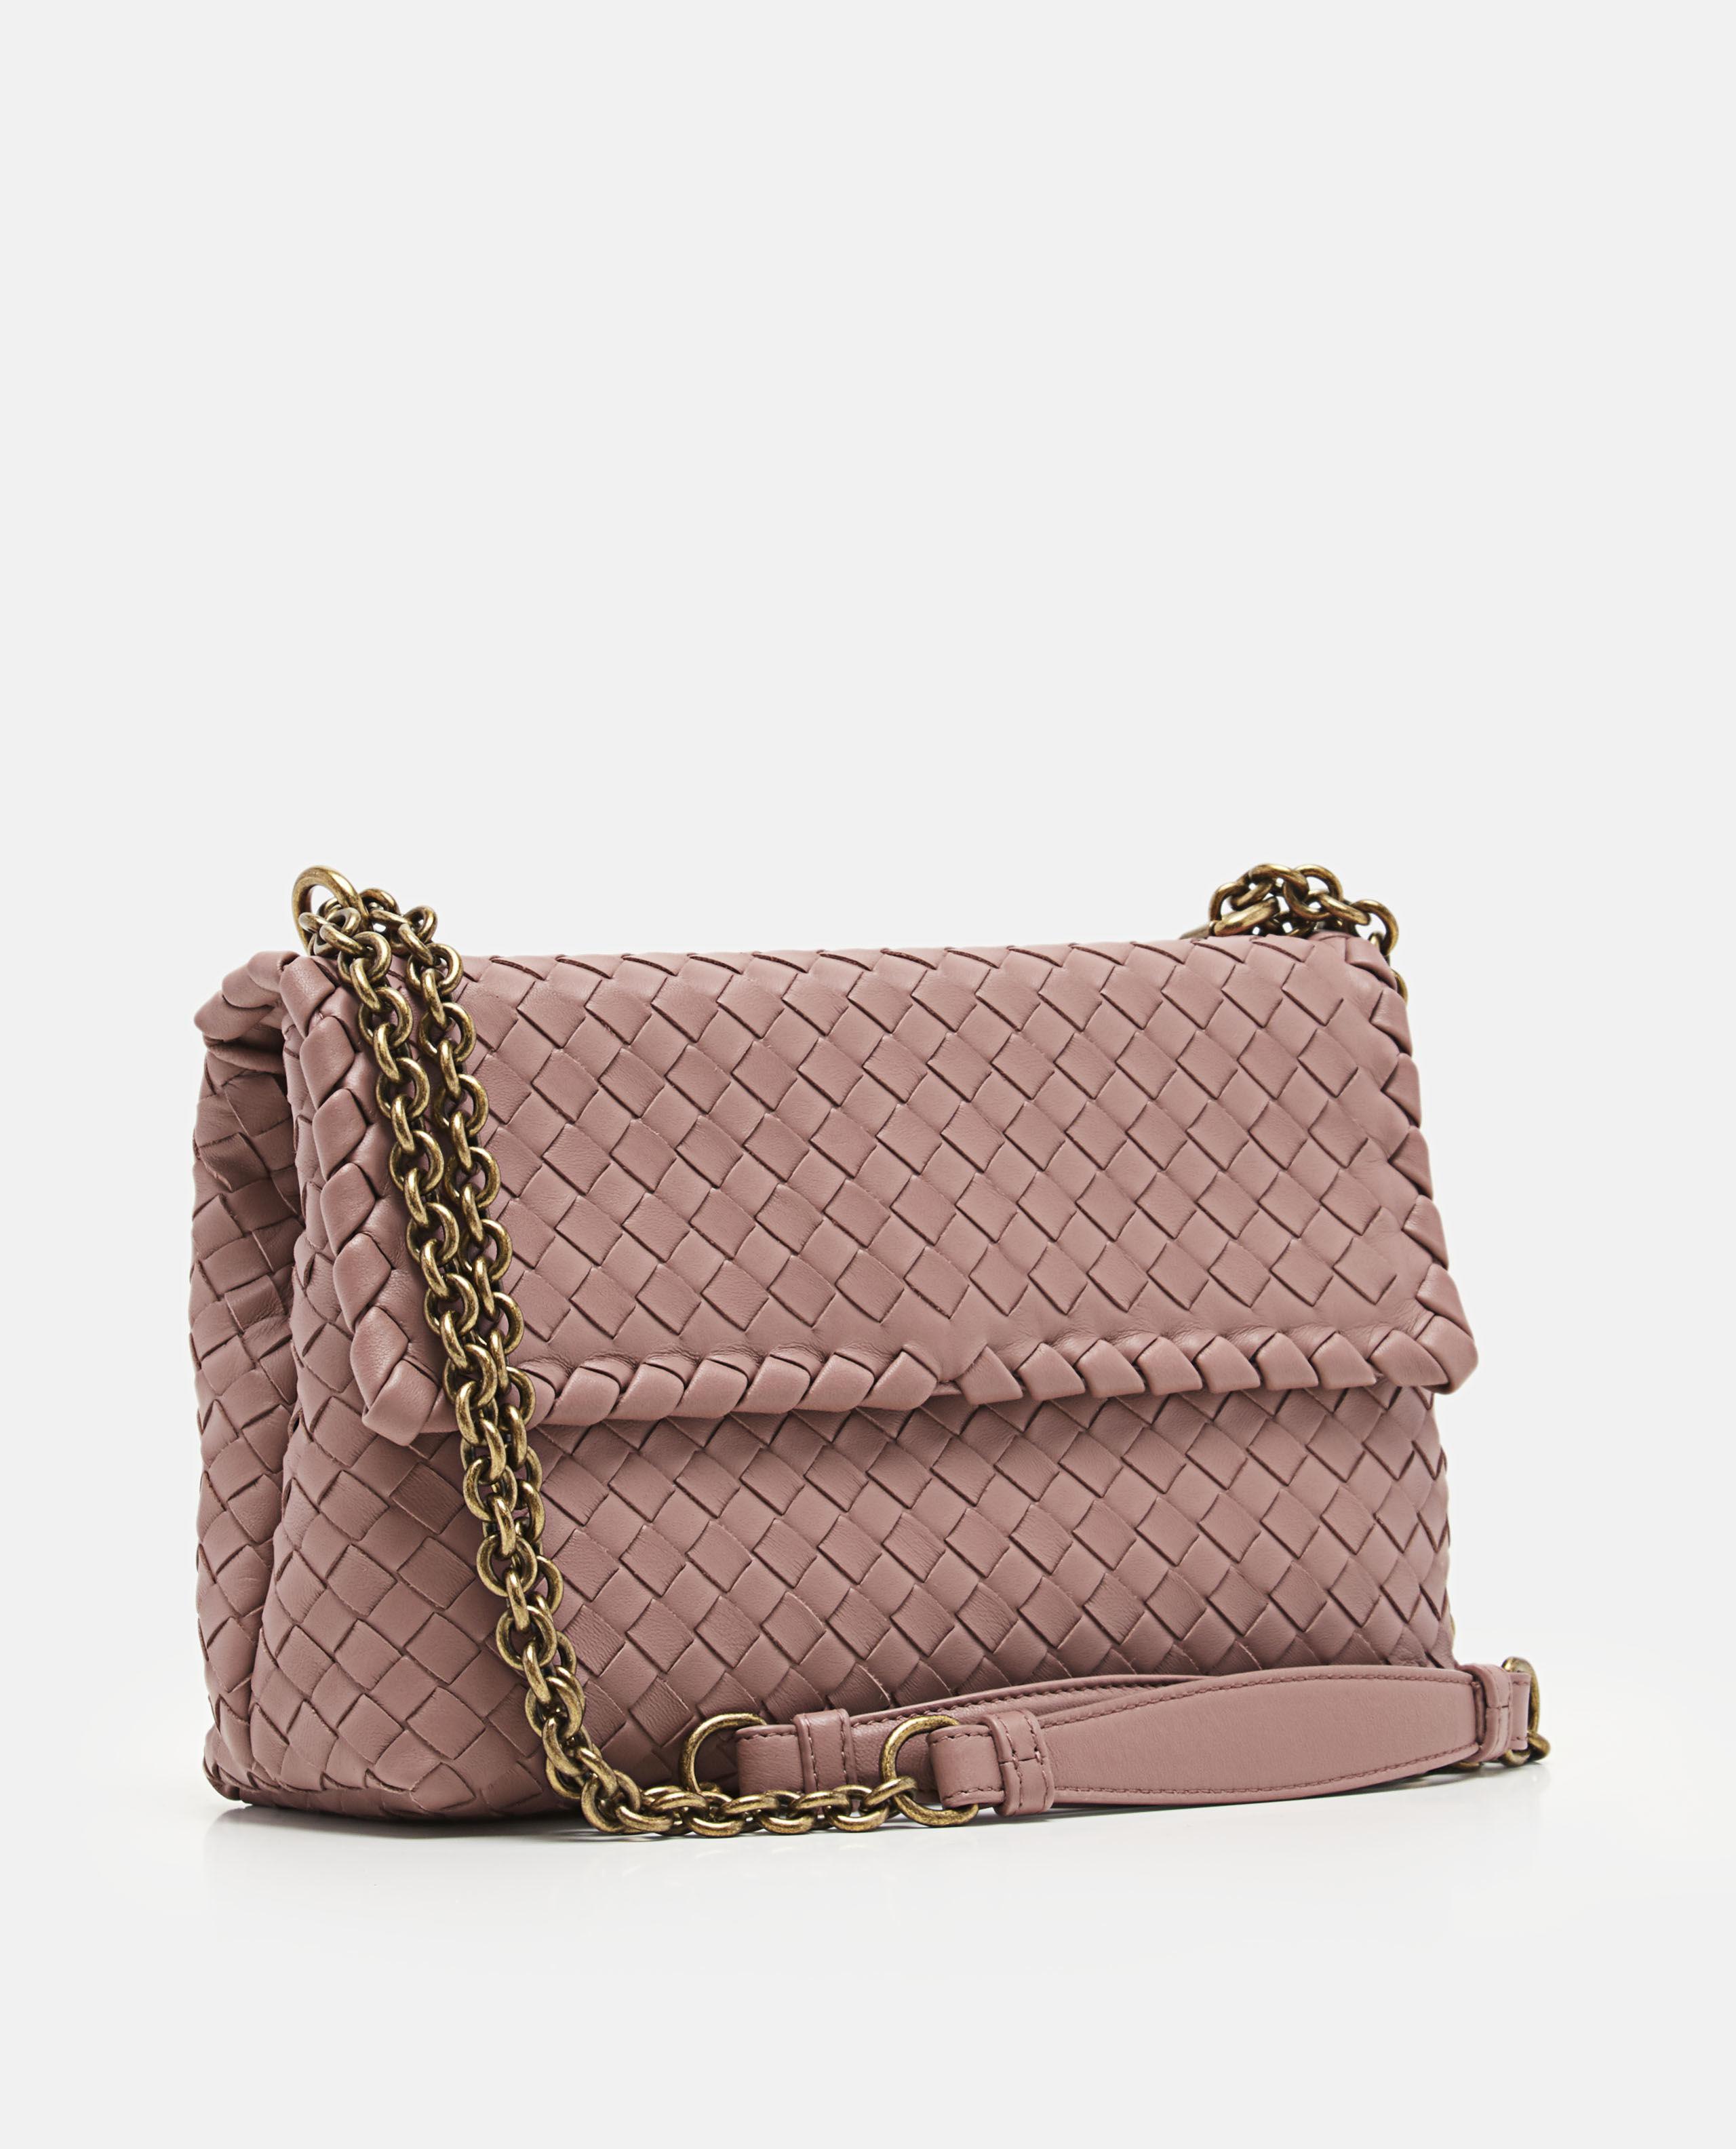 97b8f4ac546d Bottega Veneta Intrecciato Nappa Baby Olimpia Bag in Pink - Lyst